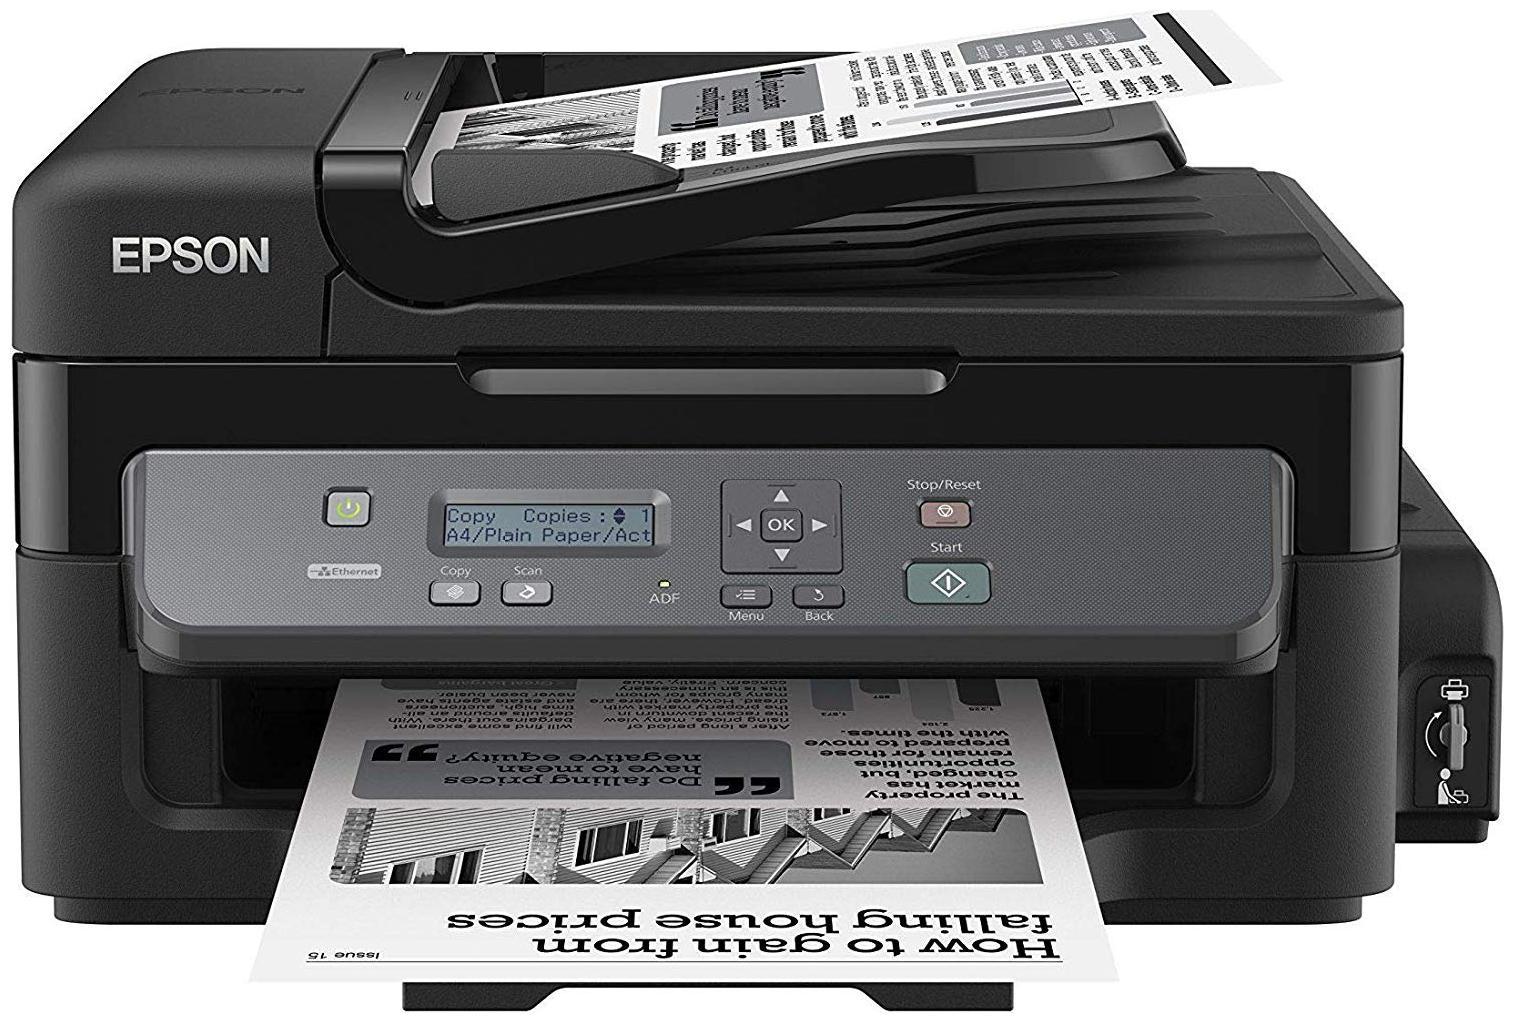 Printers | Buy Printer (प्रिंटर) at Best Price Online